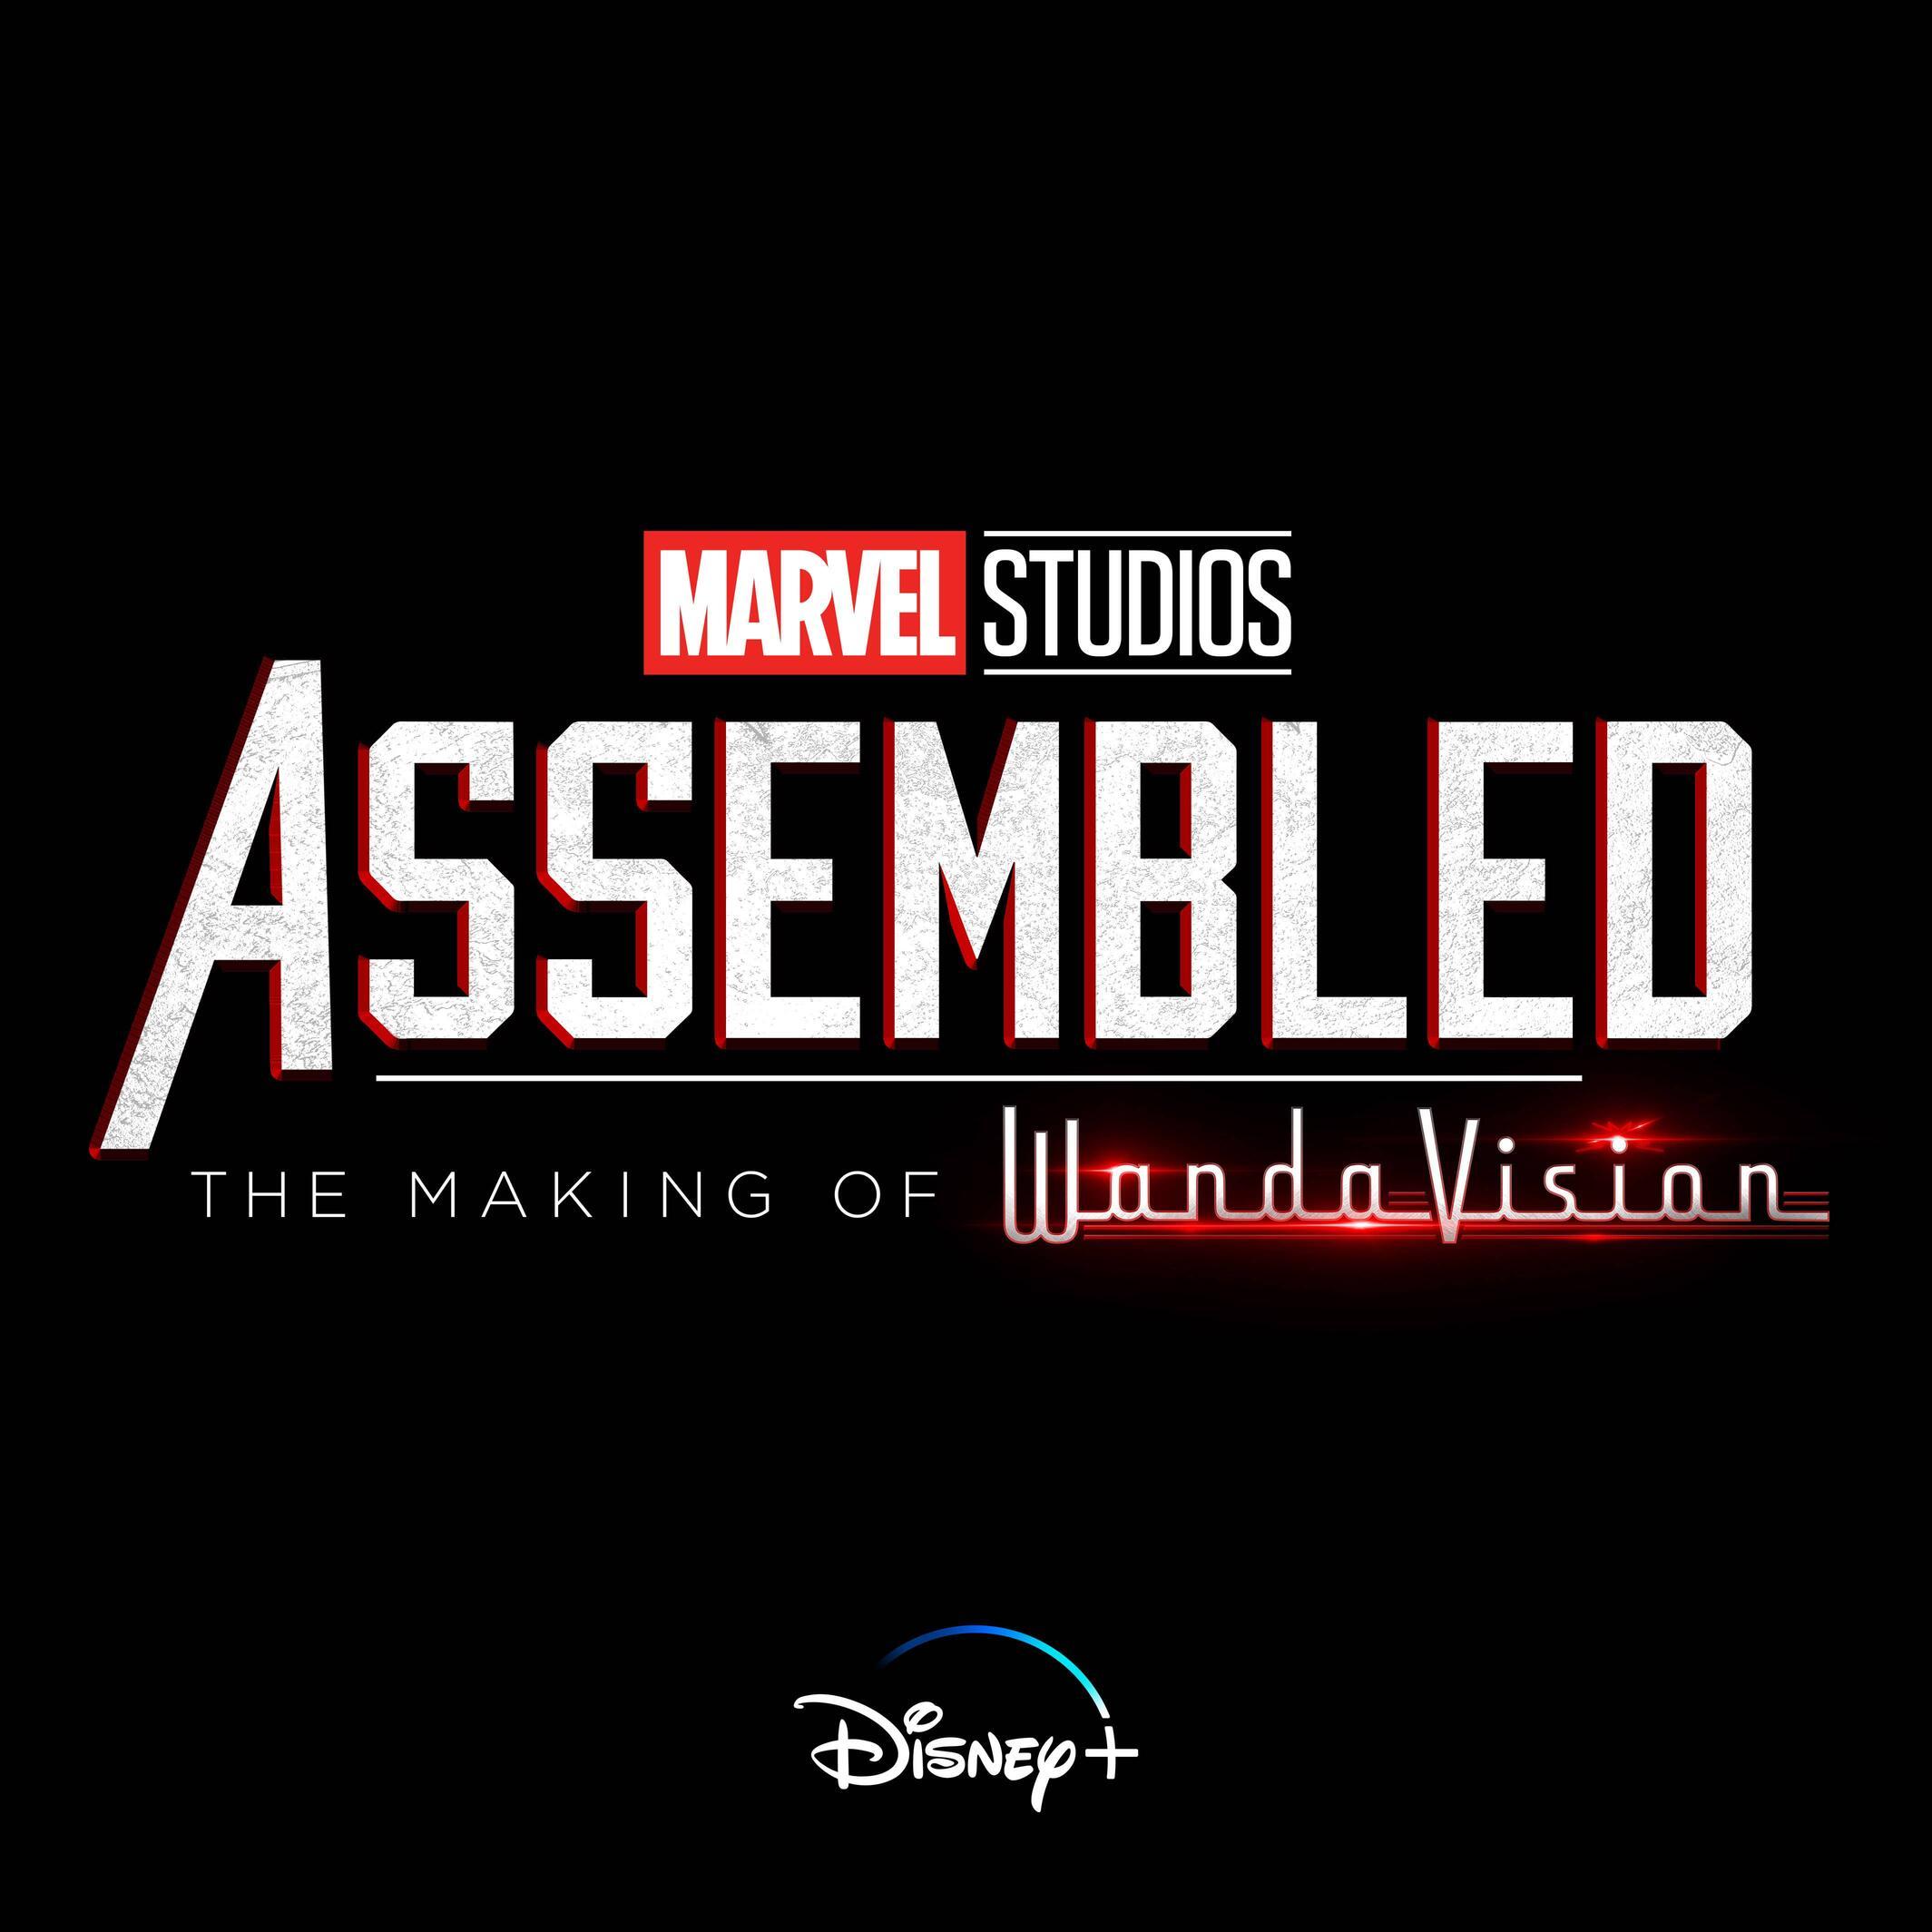 Marvel, Assembled, Marvel Studios